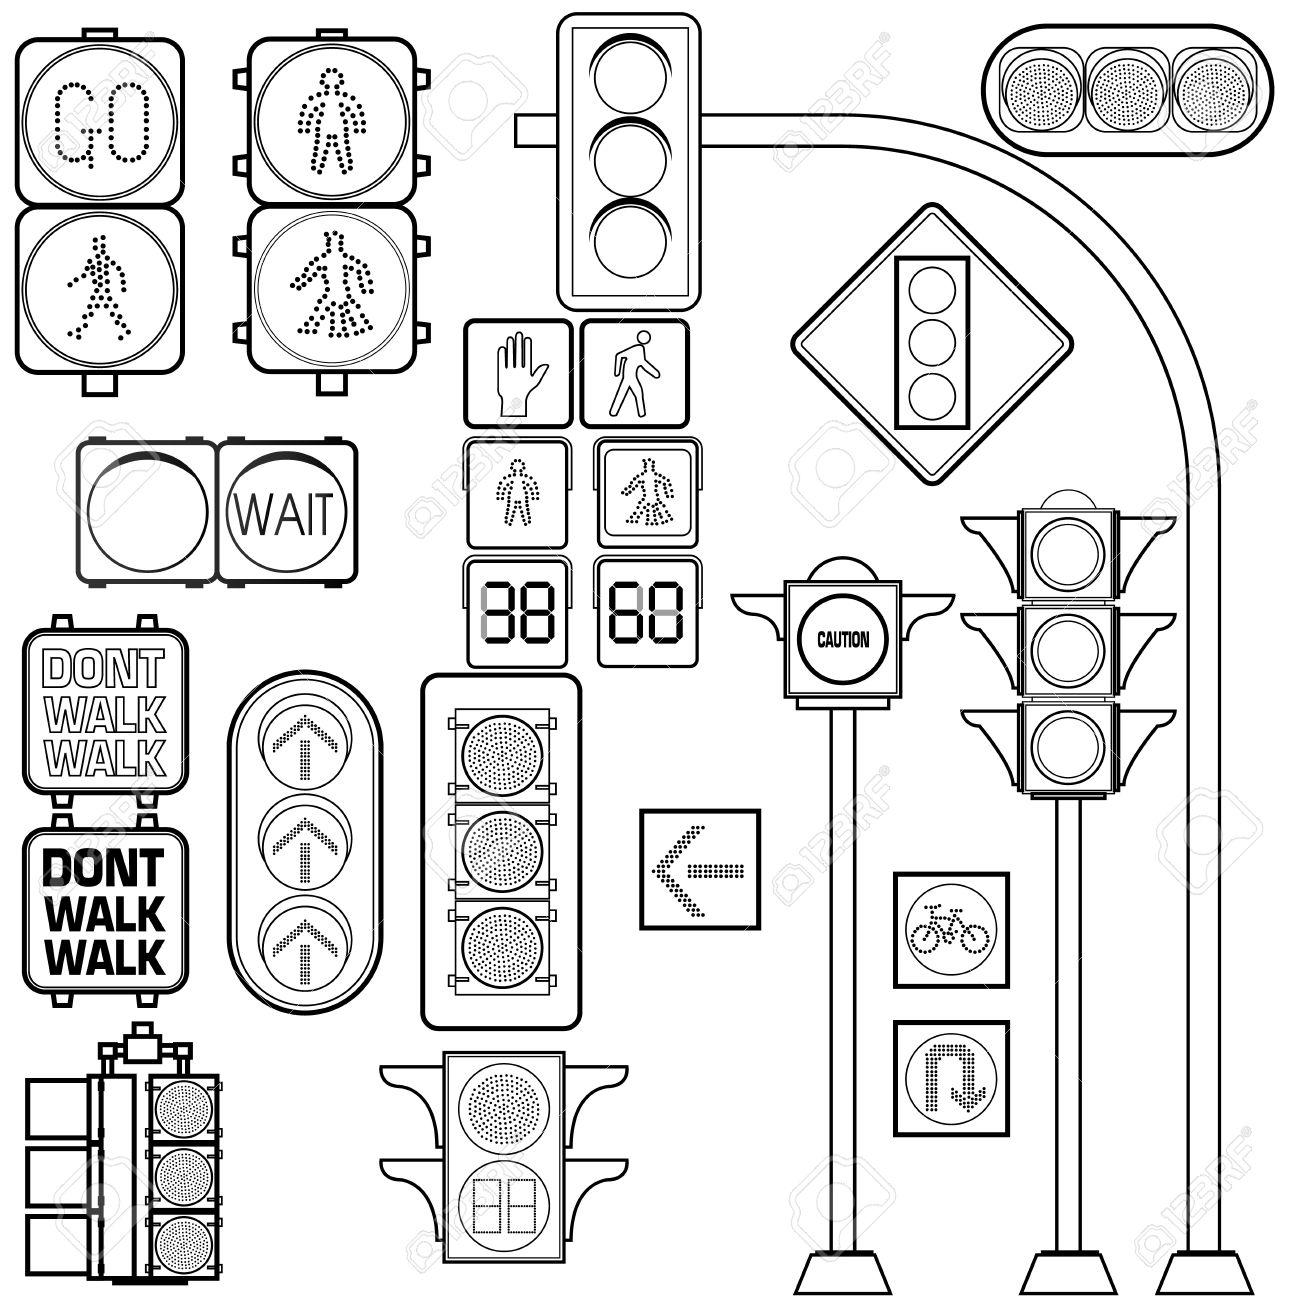 Enchanting traffic light wiring diagram mold everything you need